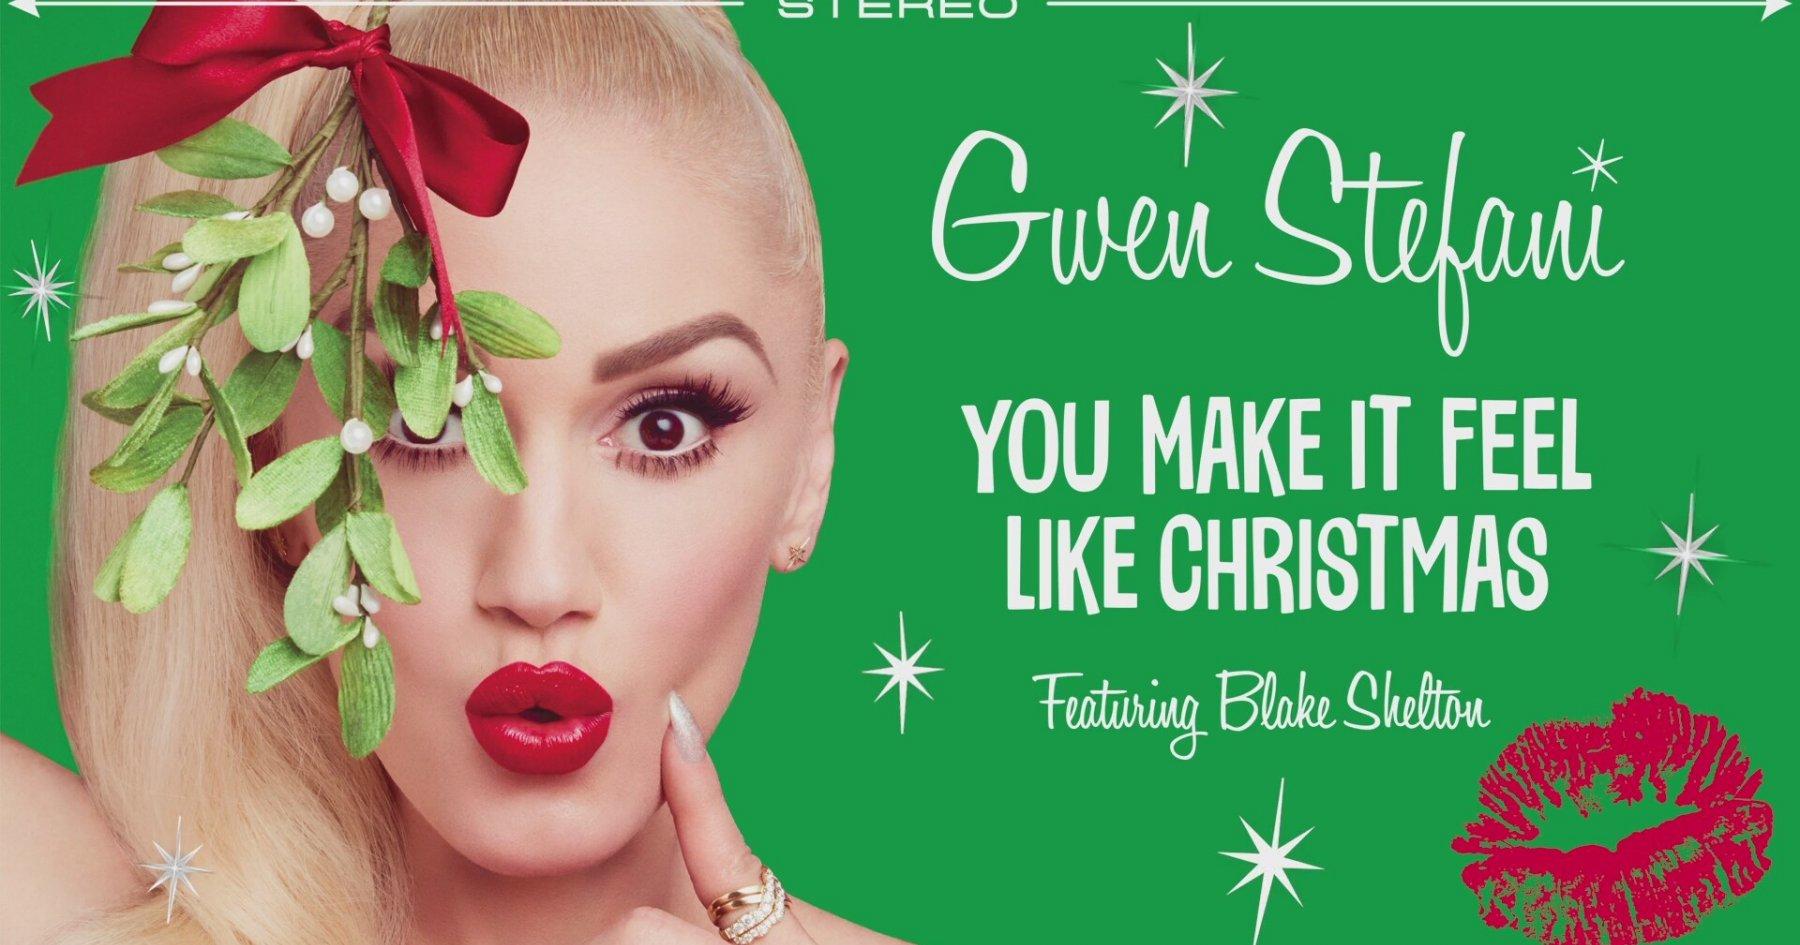 Gwen Stefani - You Make It Feel Like Christmas   İzlesene.com